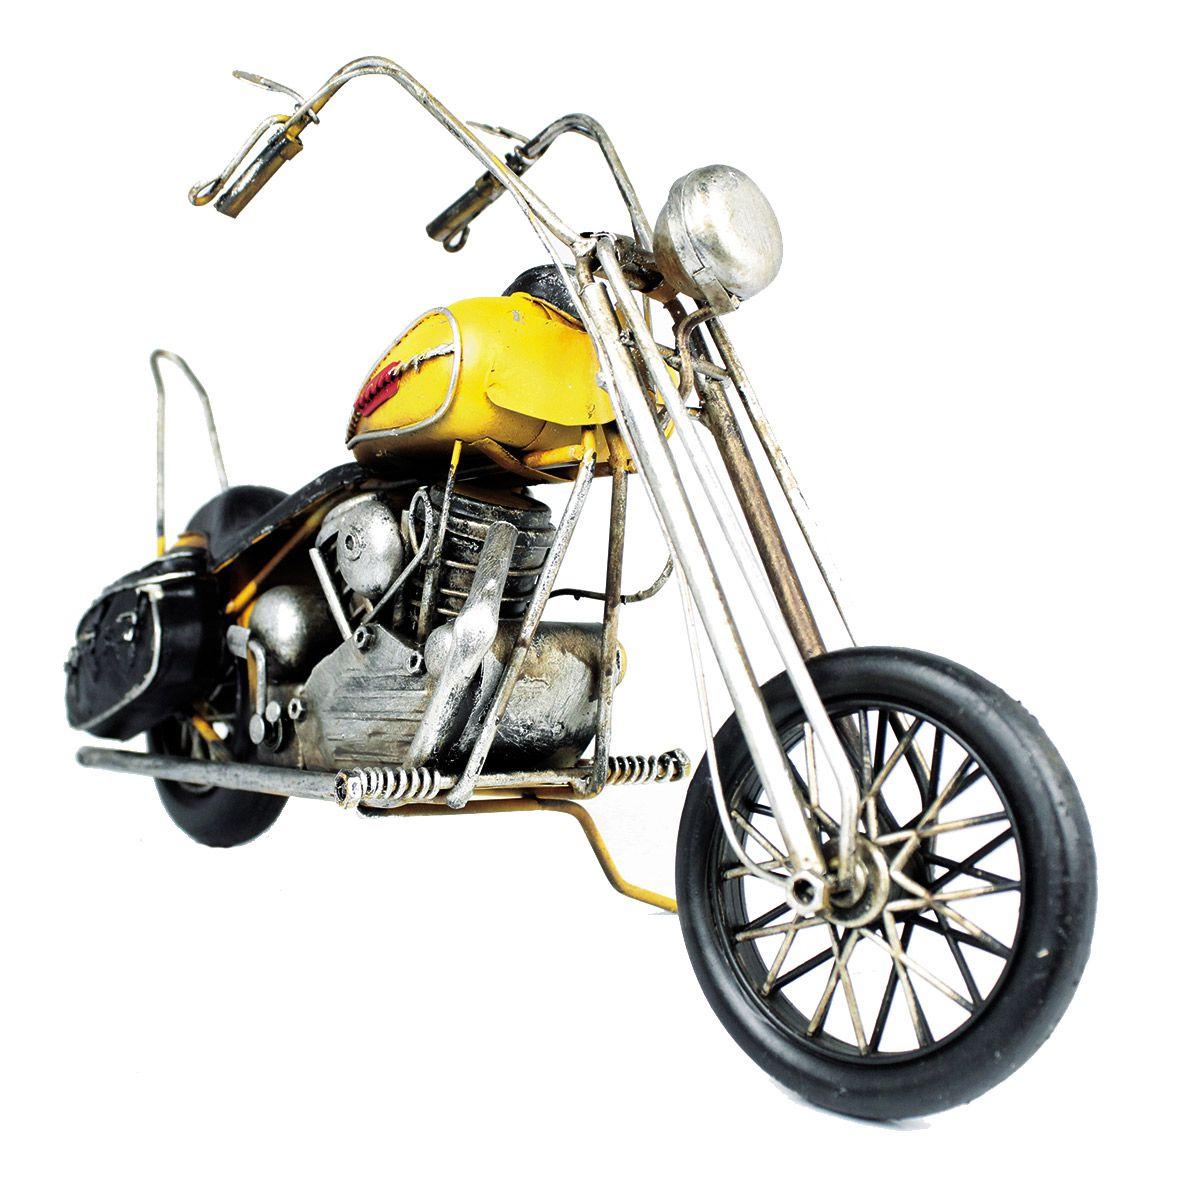 Moto de metal Chopper Hydra Glide Customizada Ano 1949 Amarelo